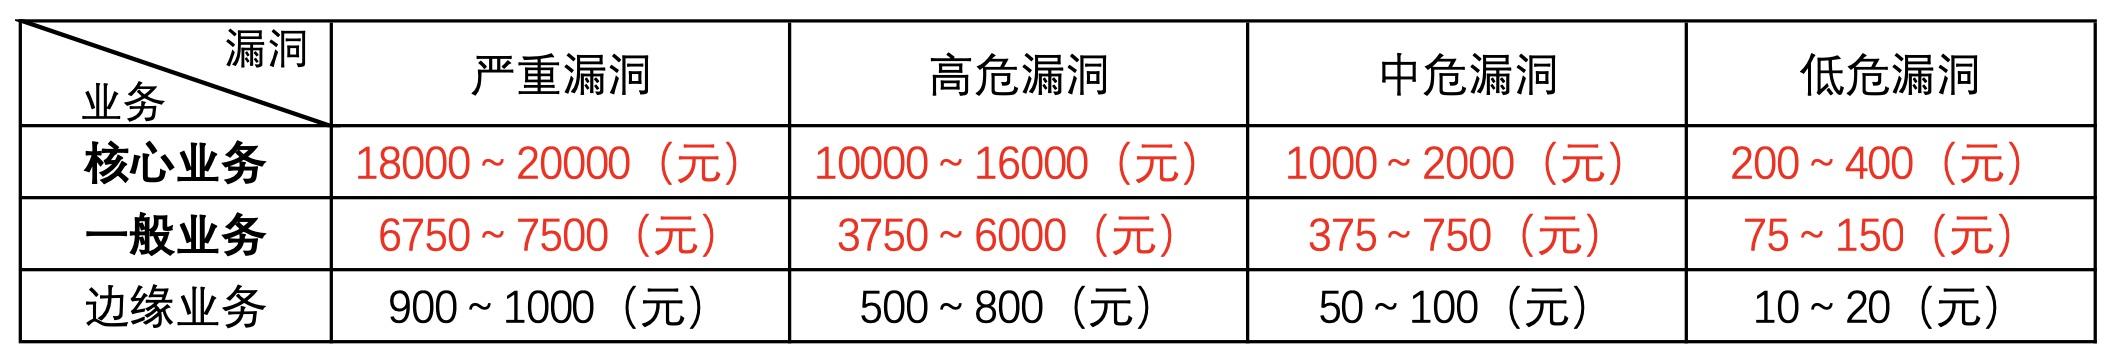 https://momo-mmsrc.oss-cn-hangzhou.aliyuncs.com/img-204656a8-adb5-36d0-934c-5ea5a7c4e396.jpeg